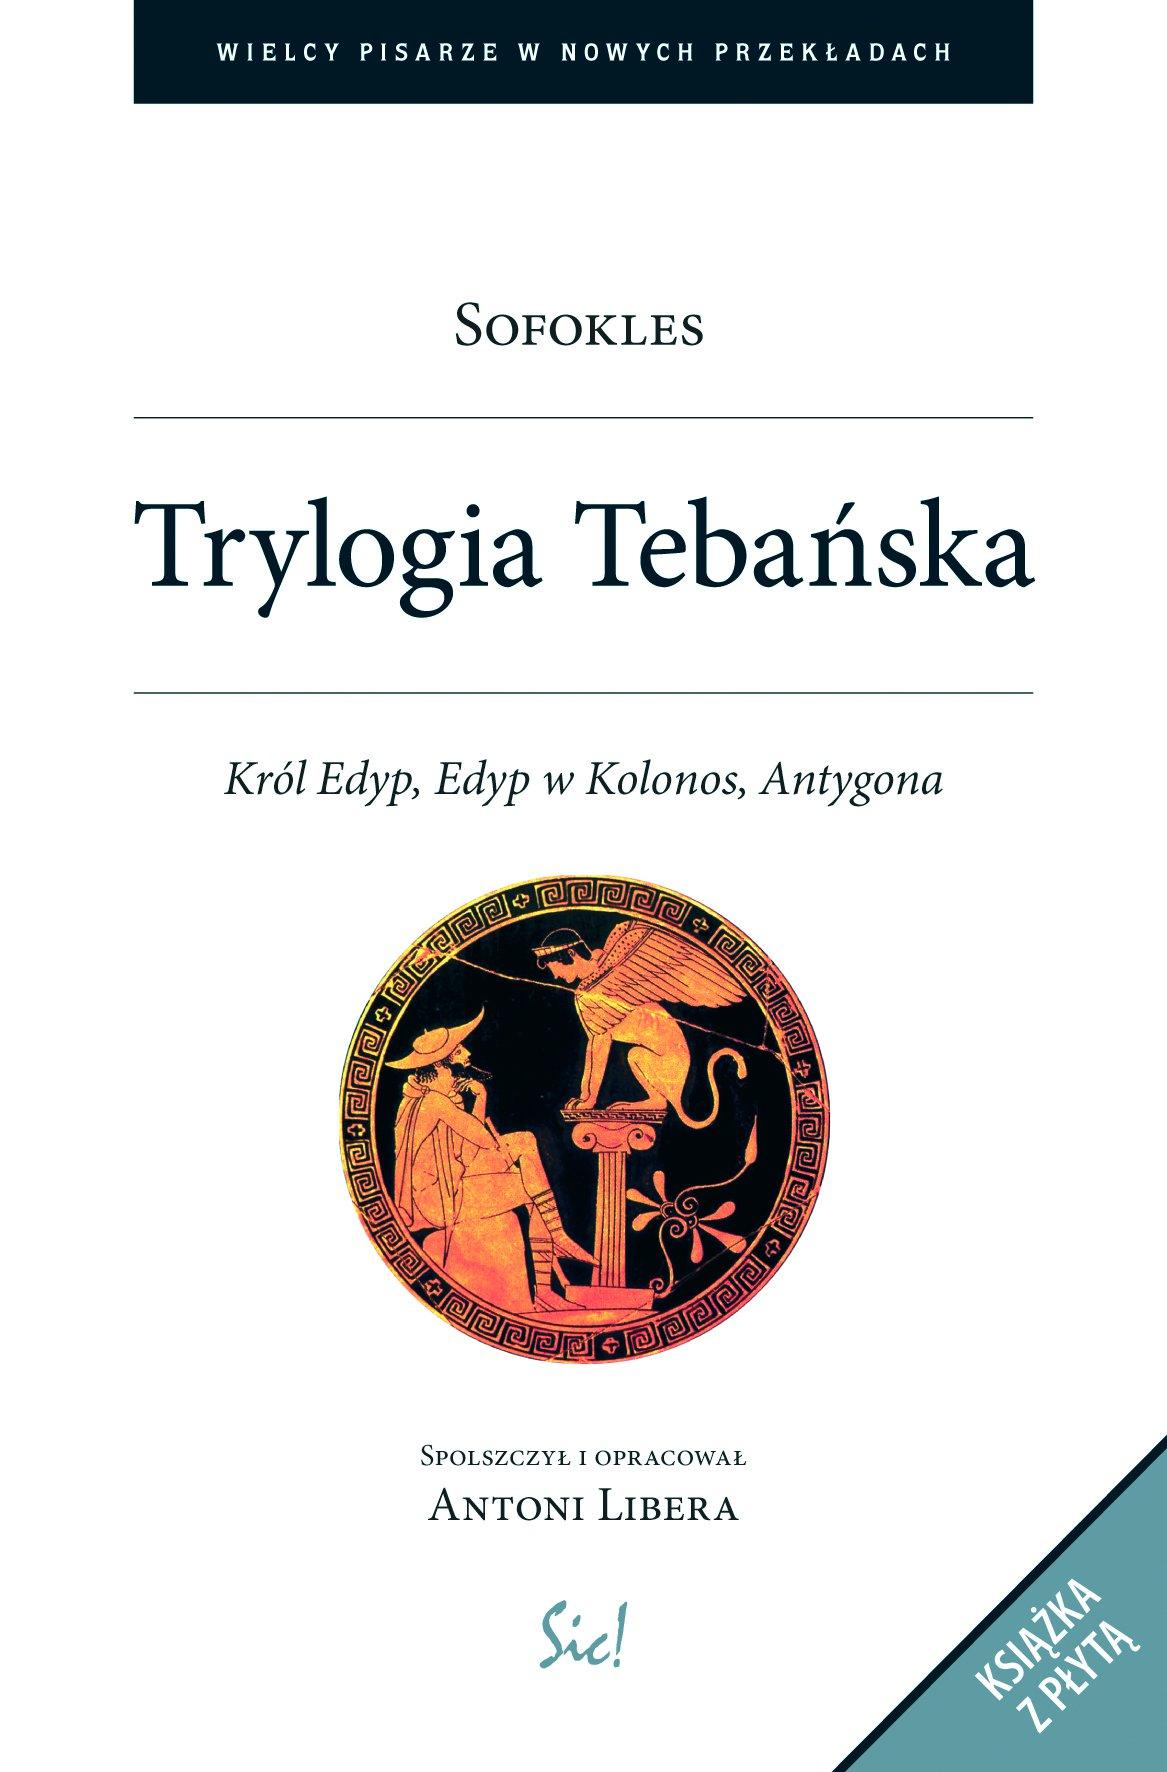 Trylogia Tebańska - Ebook (Książka EPUB) do pobrania w formacie EPUB